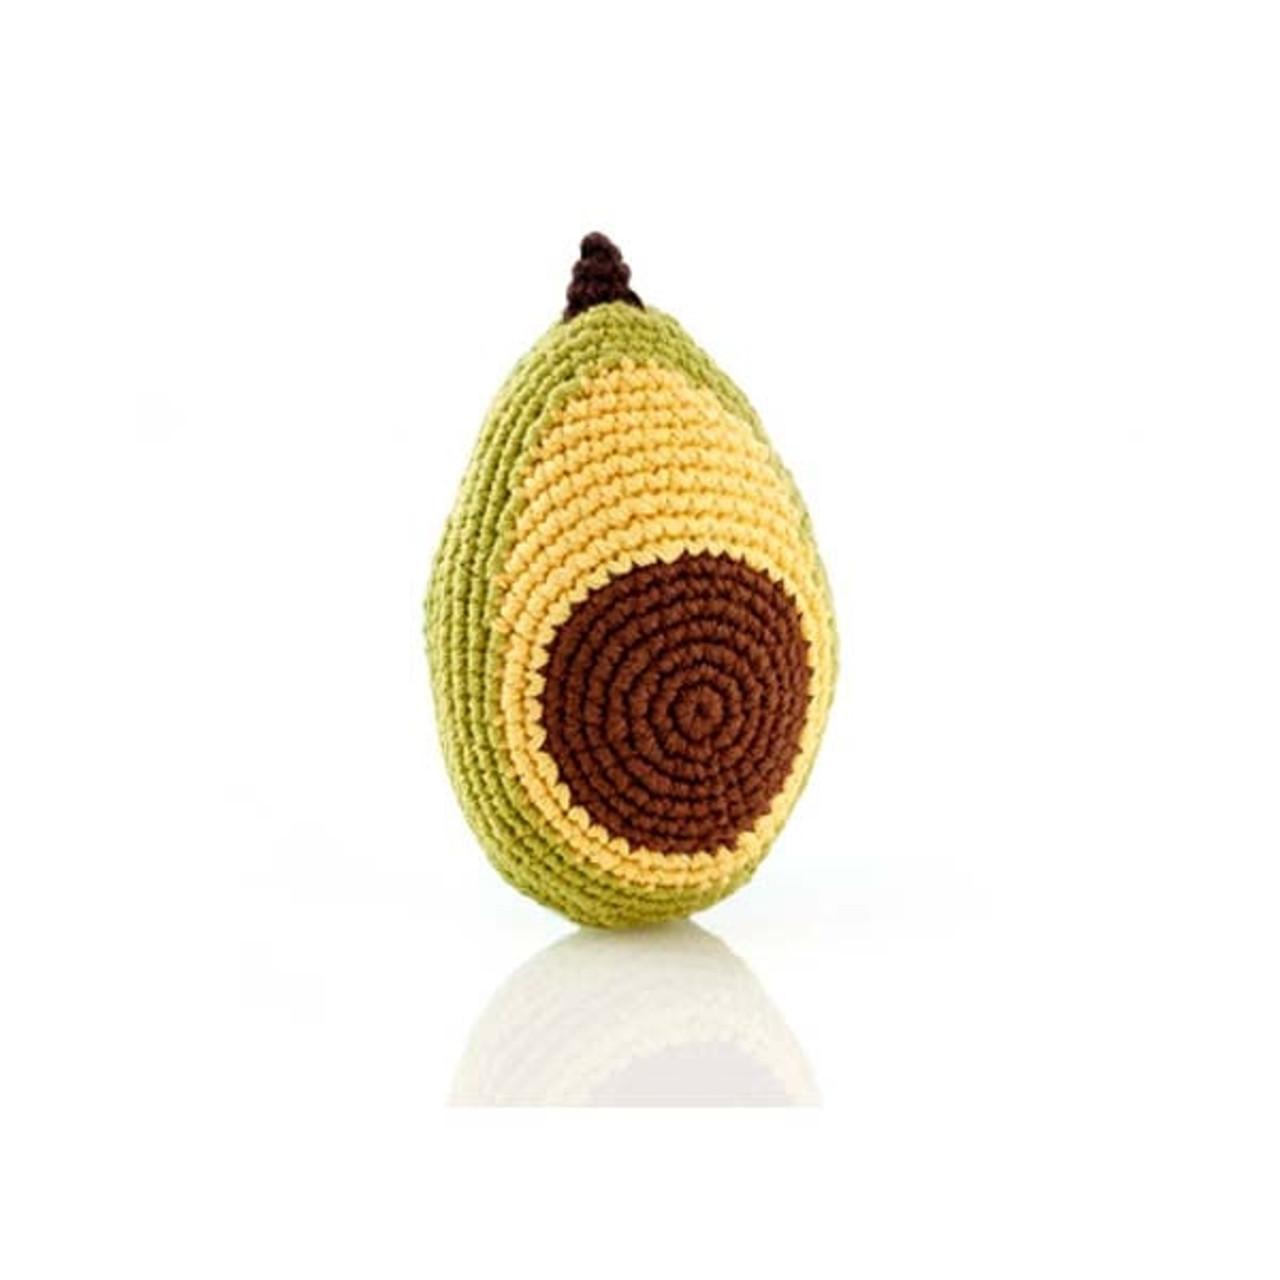 Avocado Baby Rattle